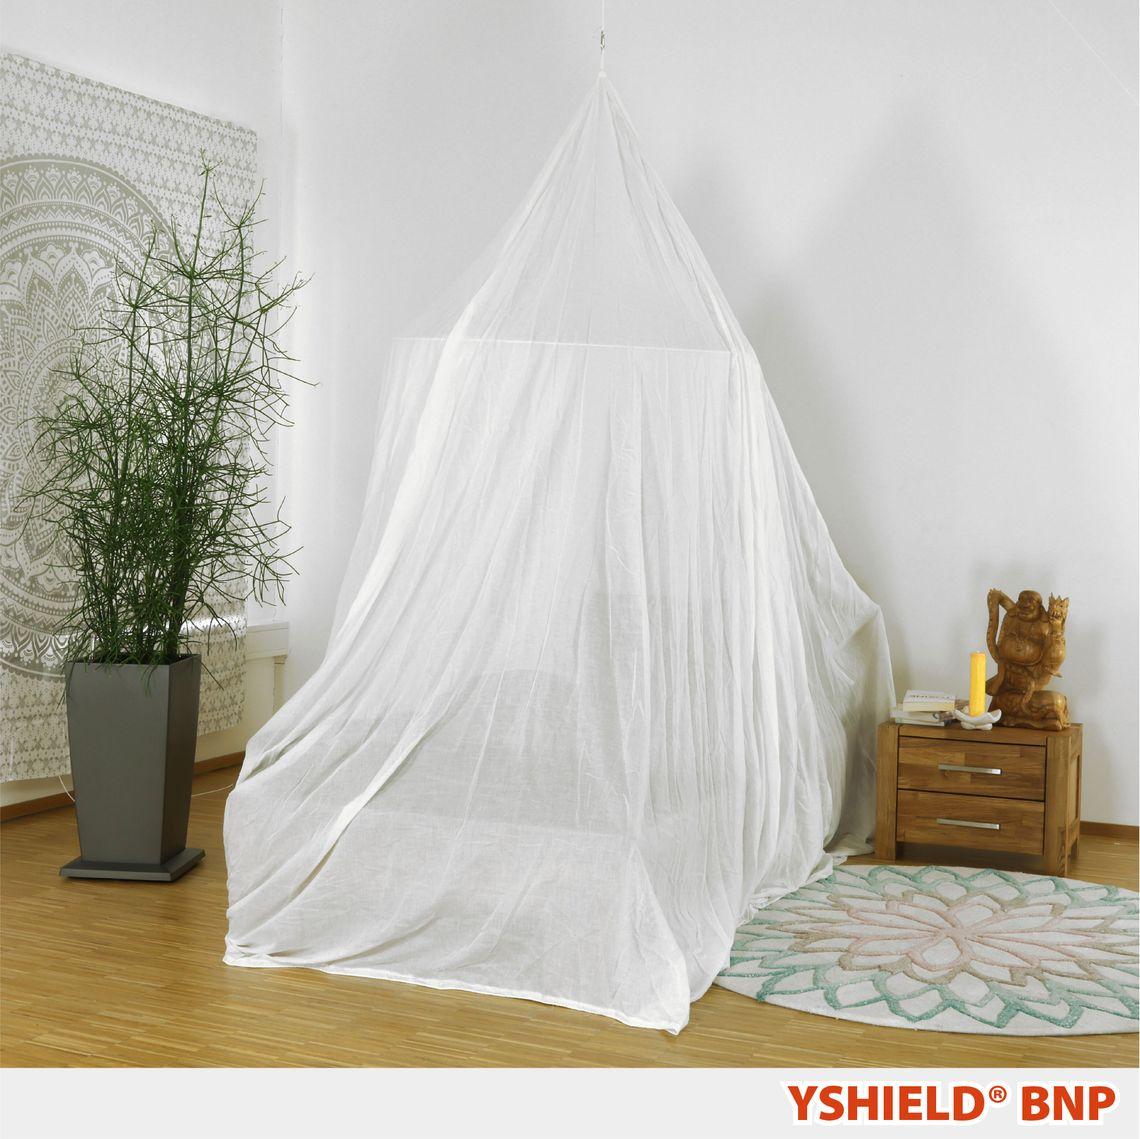 YSHIELD® BNP   Shielding canopy   Pyramidal   NATURELL